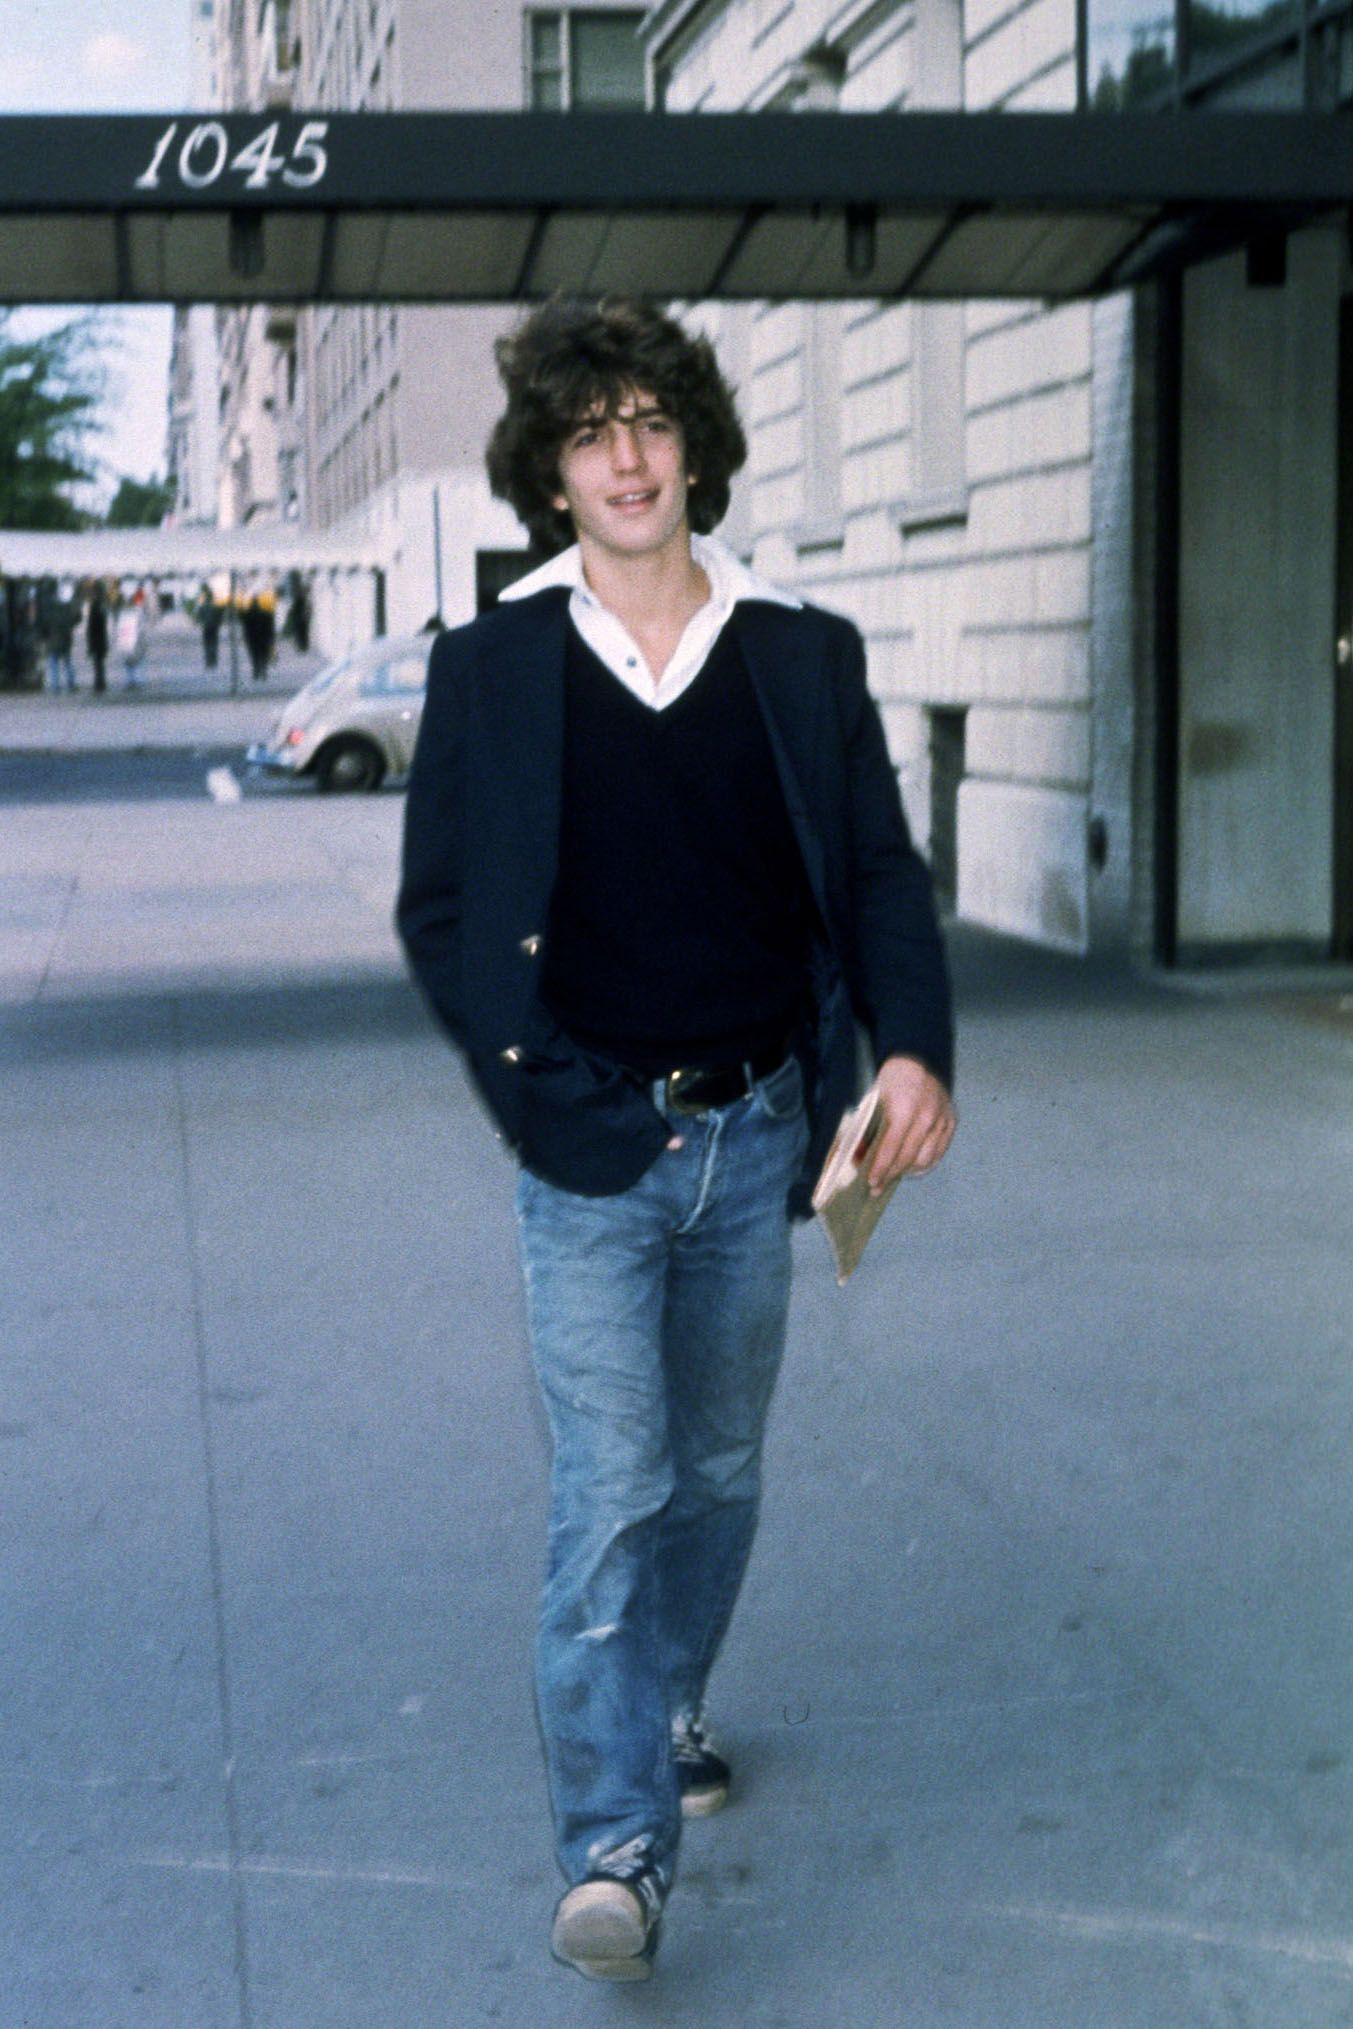 John F. Kennedy Jr. in the 1970s in New York City.